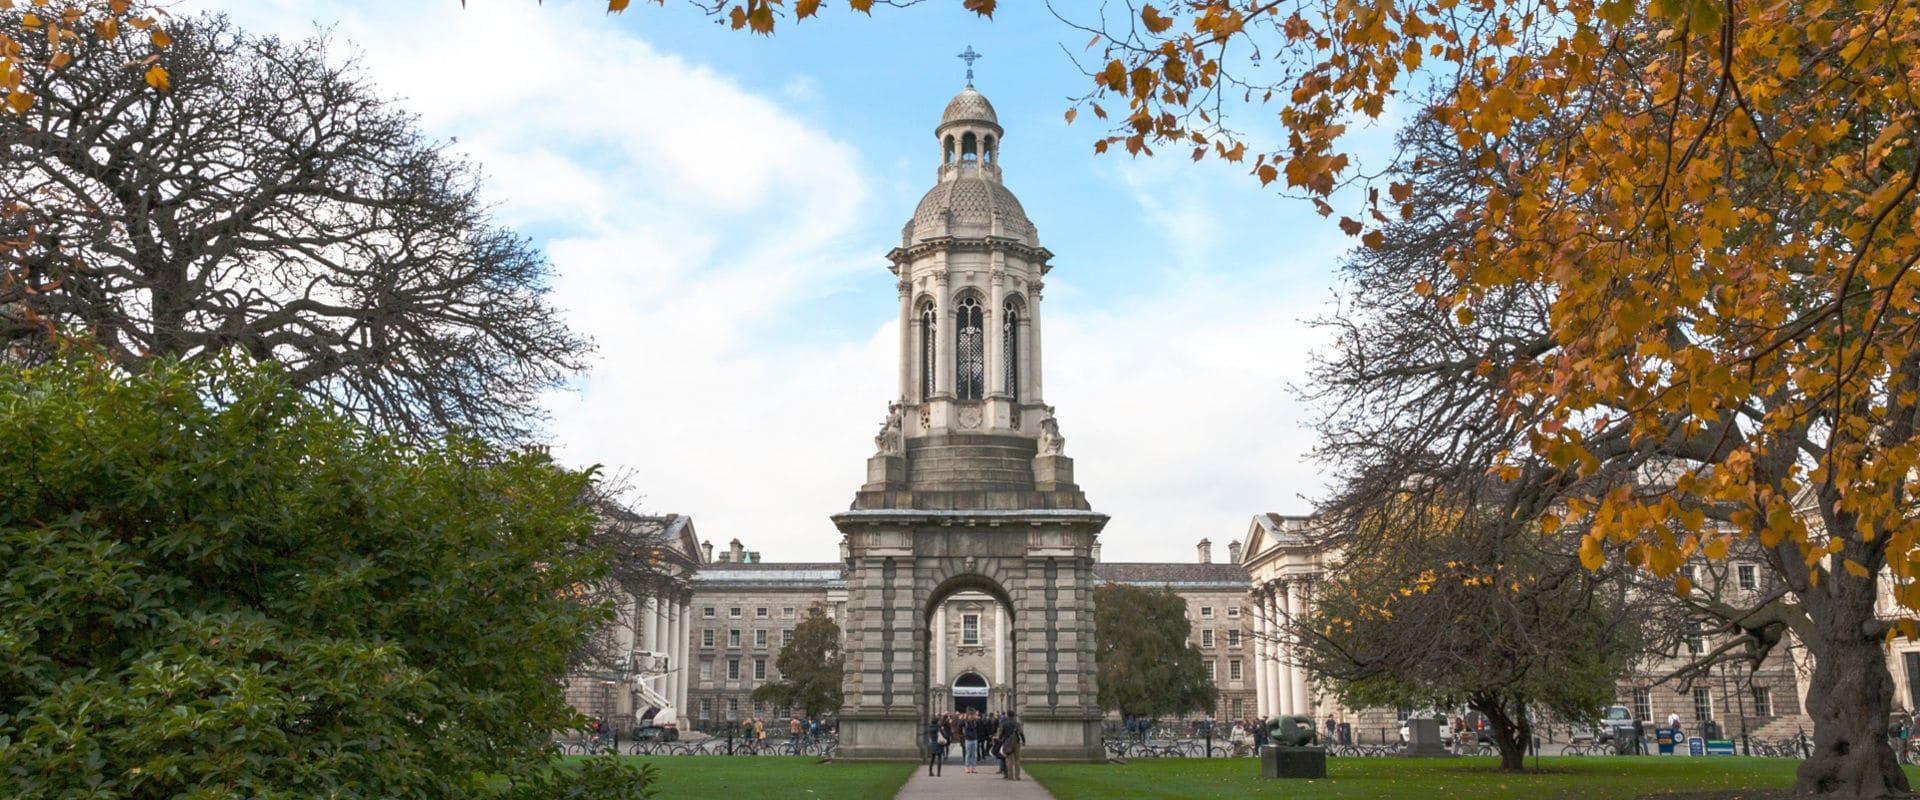 Best 7 Dating Agencies in Dublin - tonyshirley.co.uk